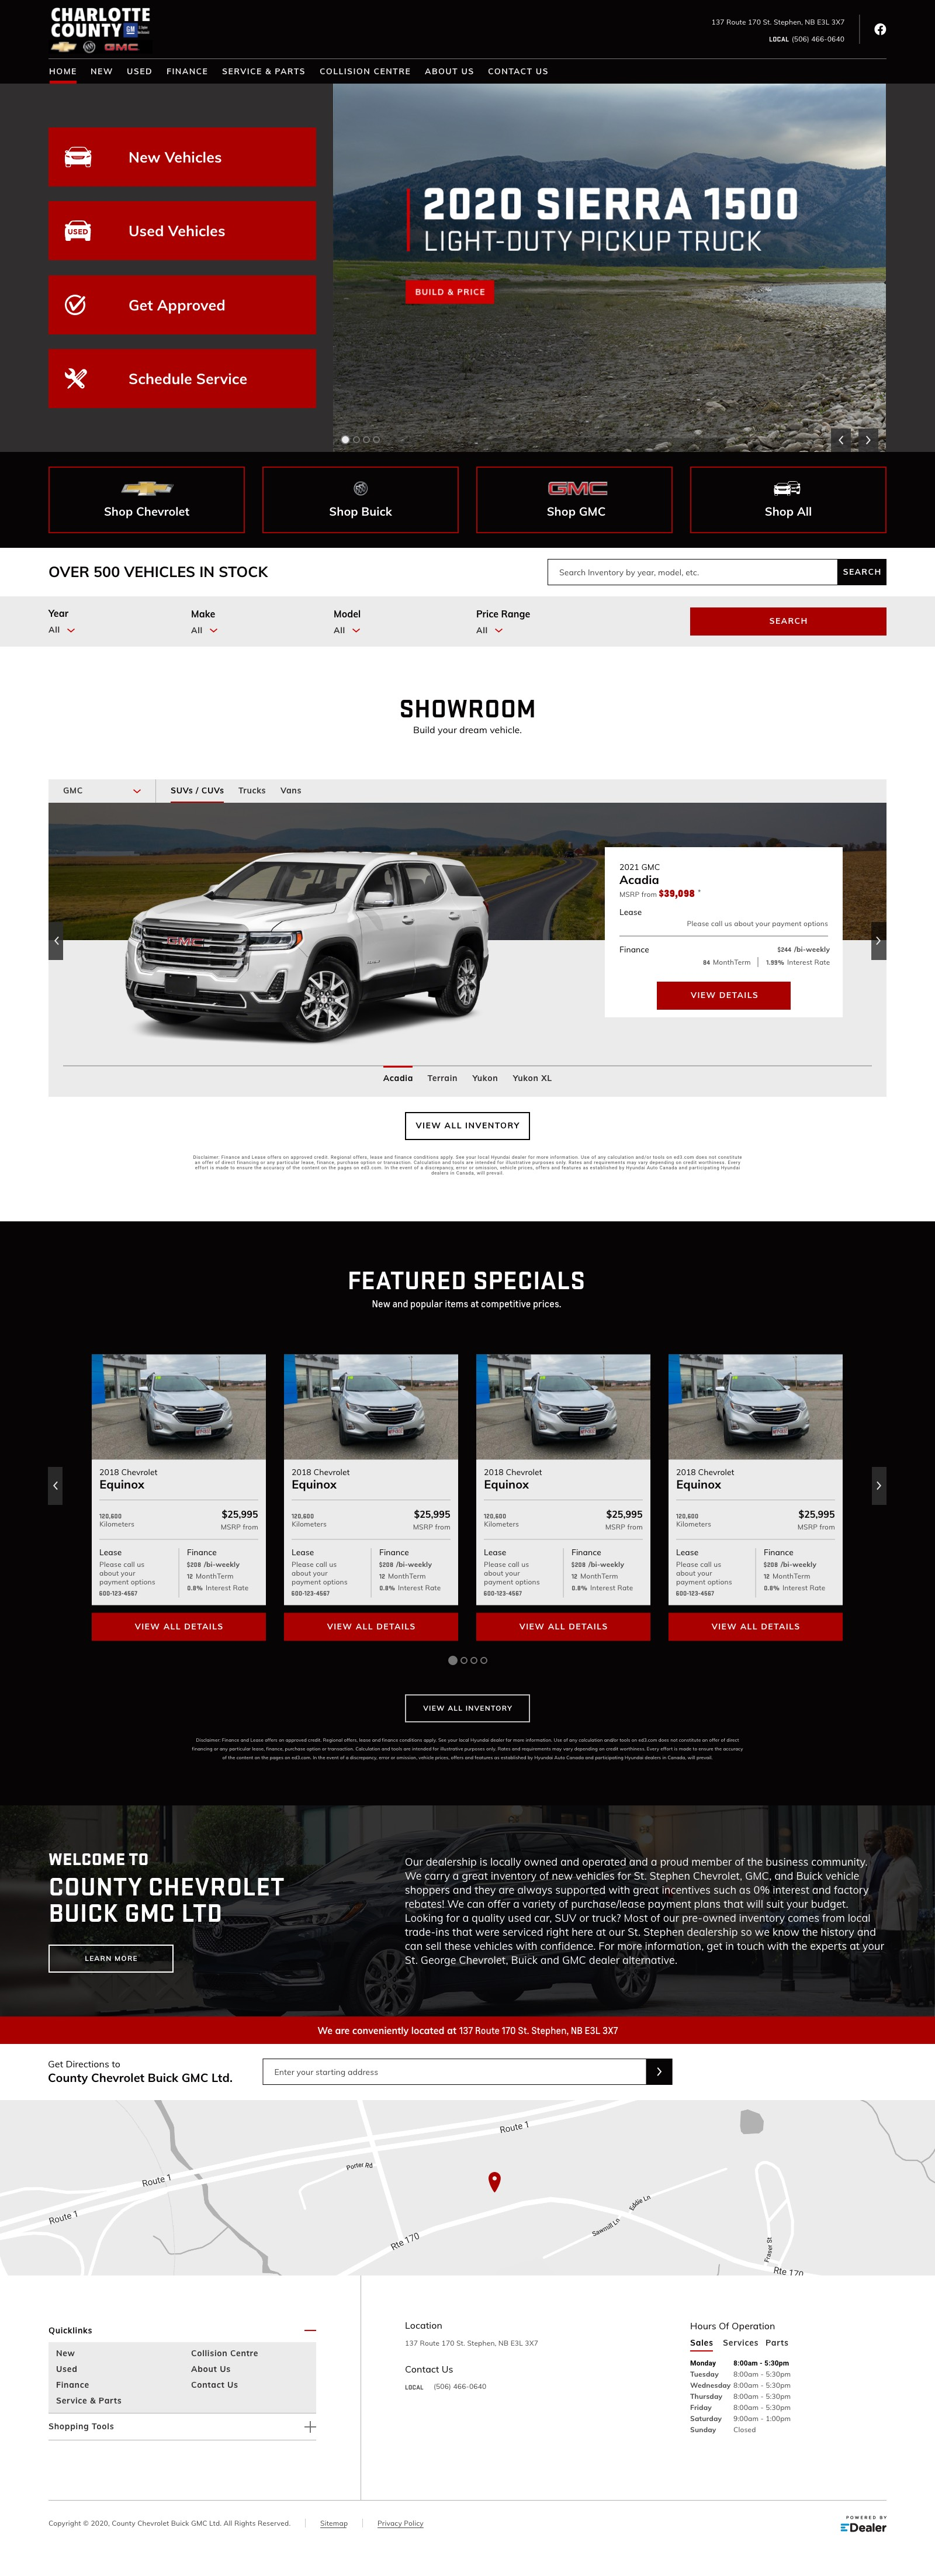 Charlotte County Chevrolet Buick GMC Ltd